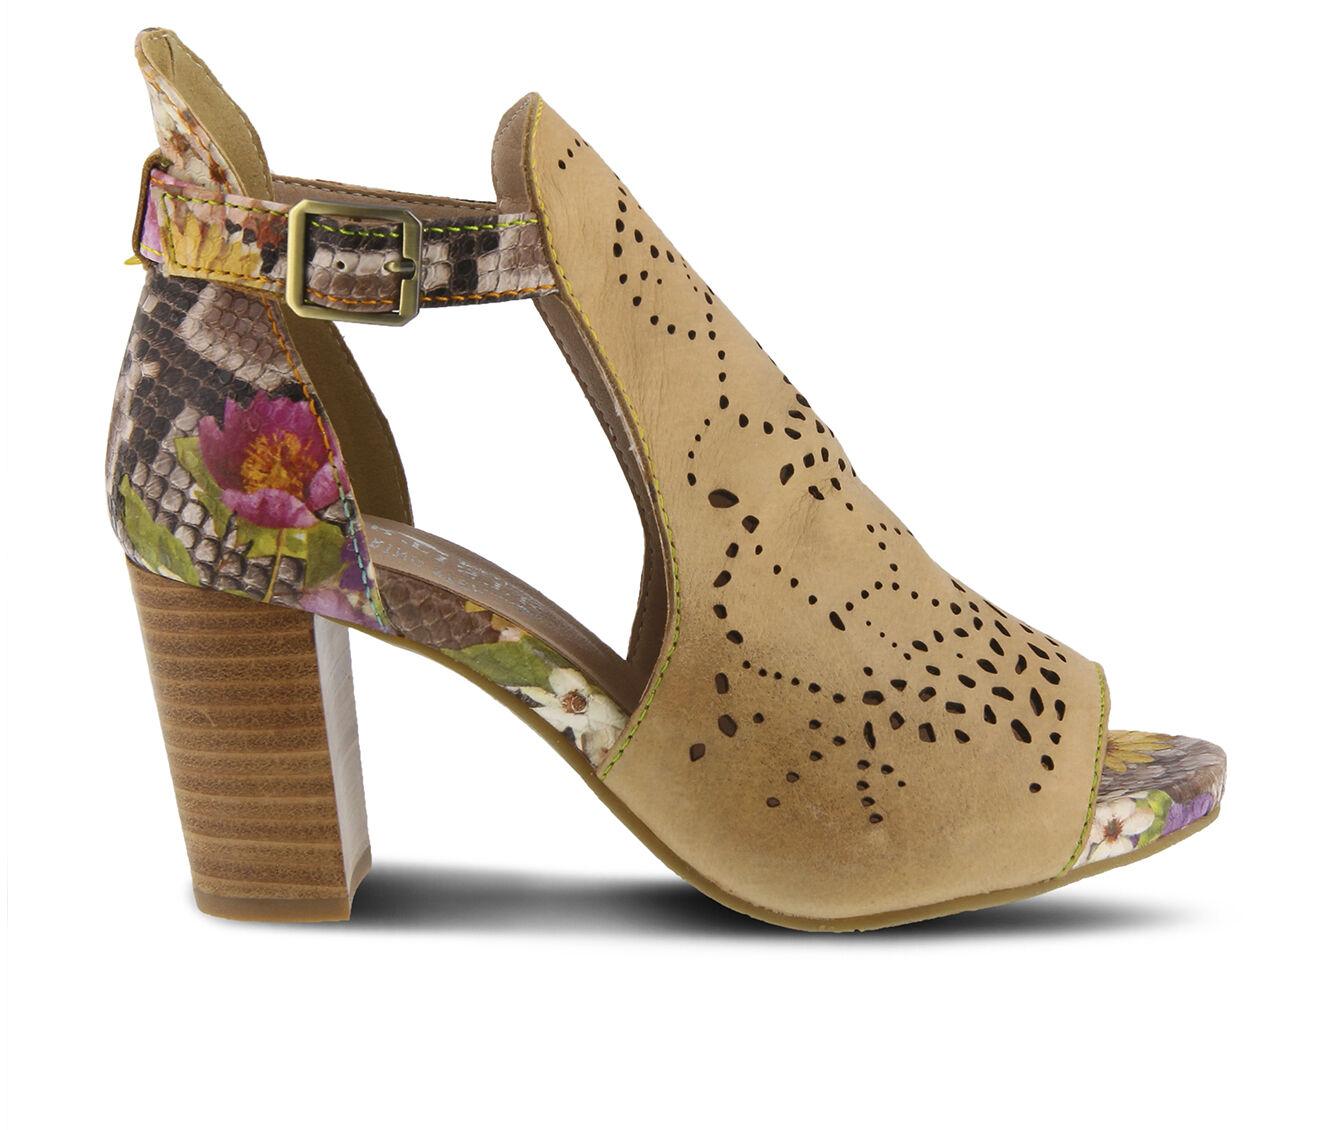 uk shoes_kd2746